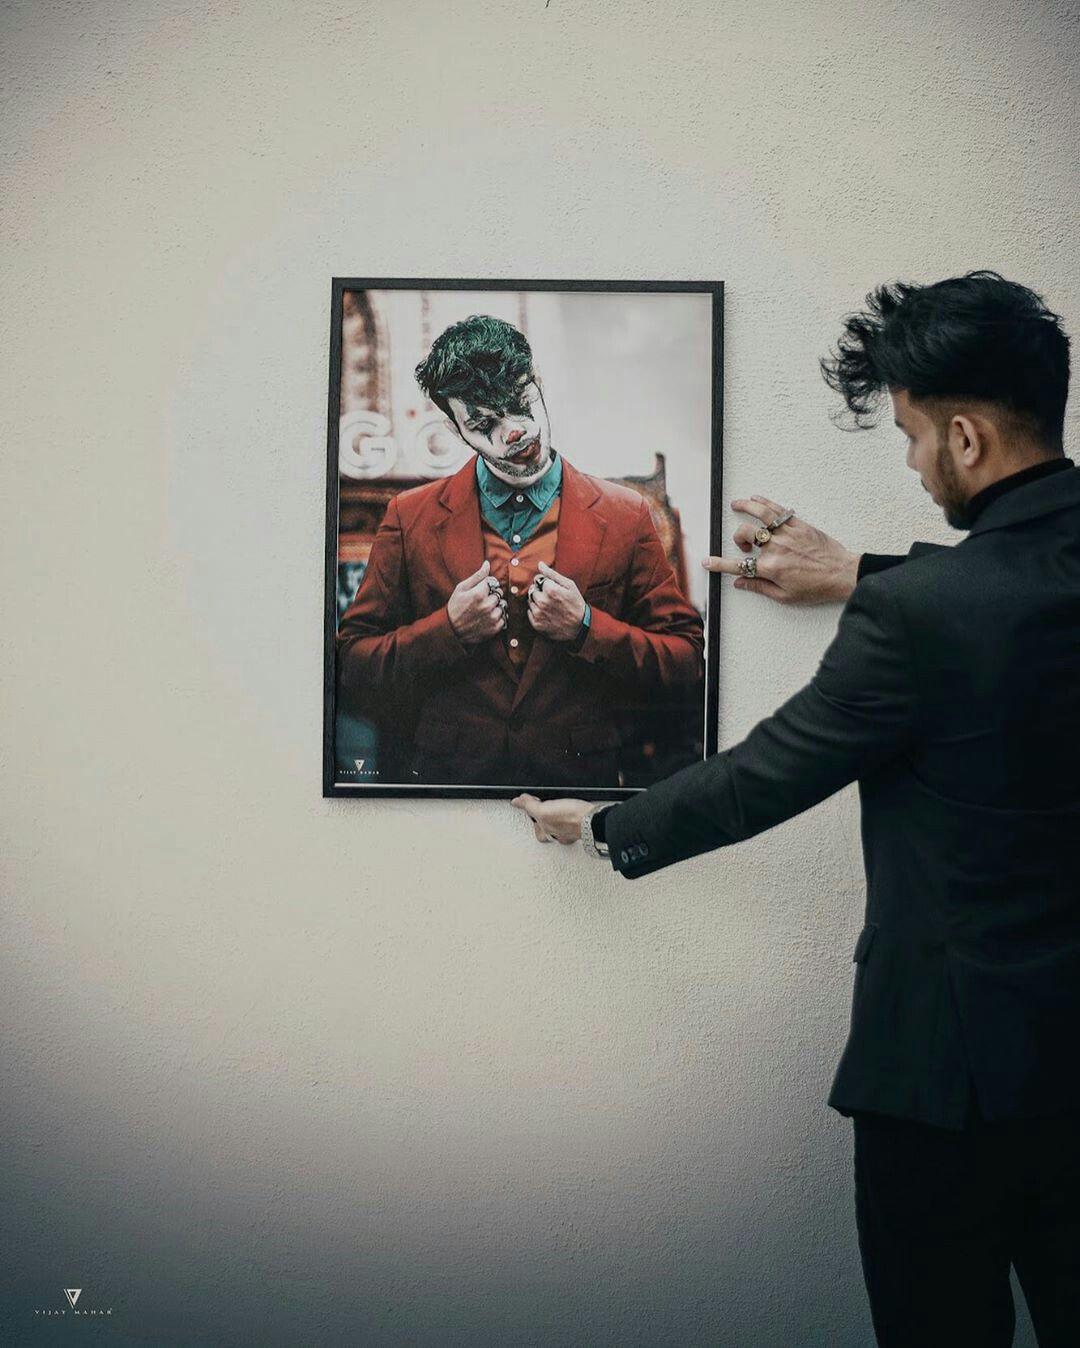 Vijay Mahar Bubbles wallpaper, Instagram, Netflix